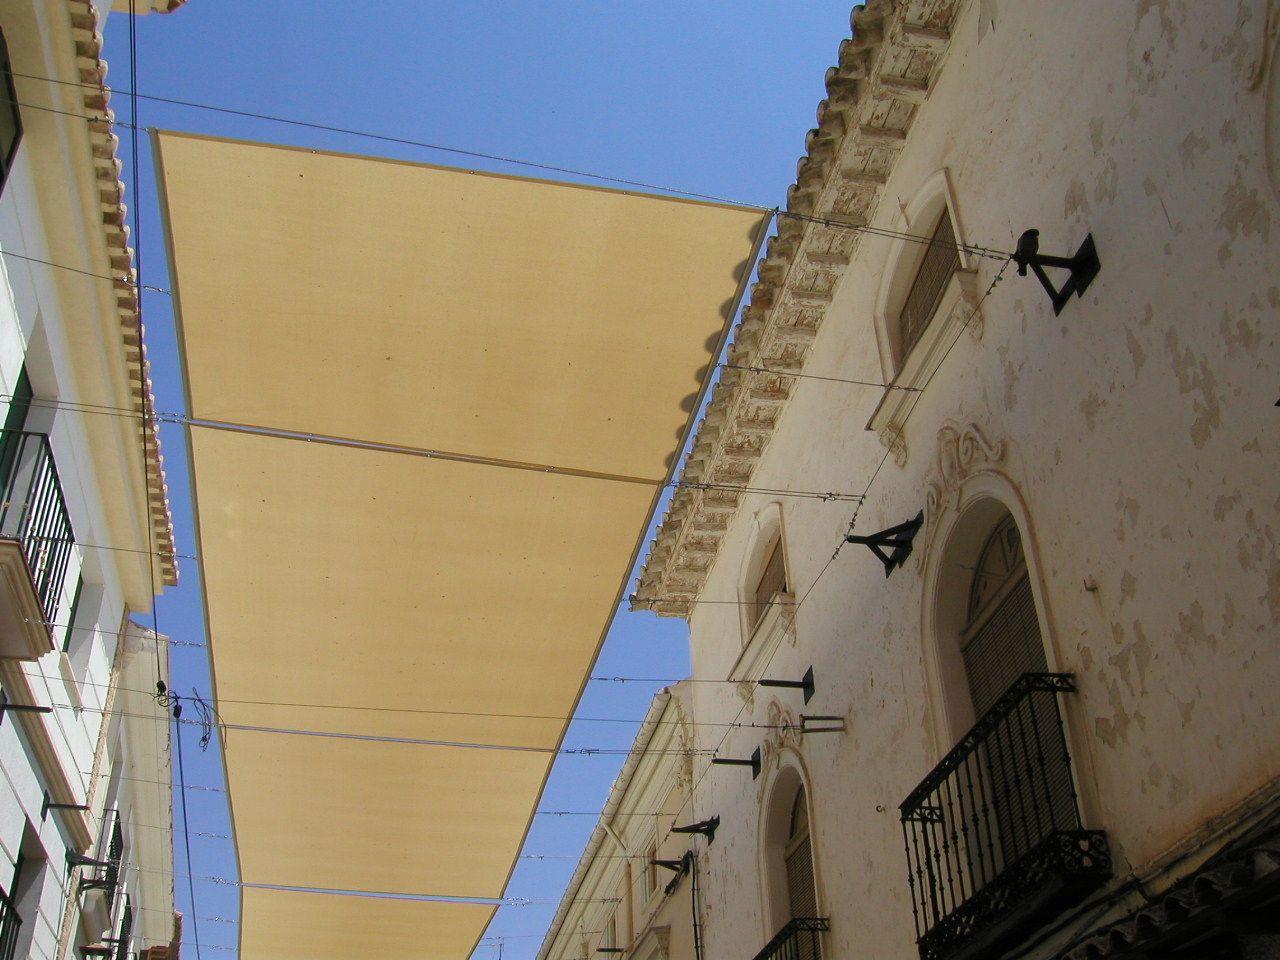 Reparación de toldos en Córdoba